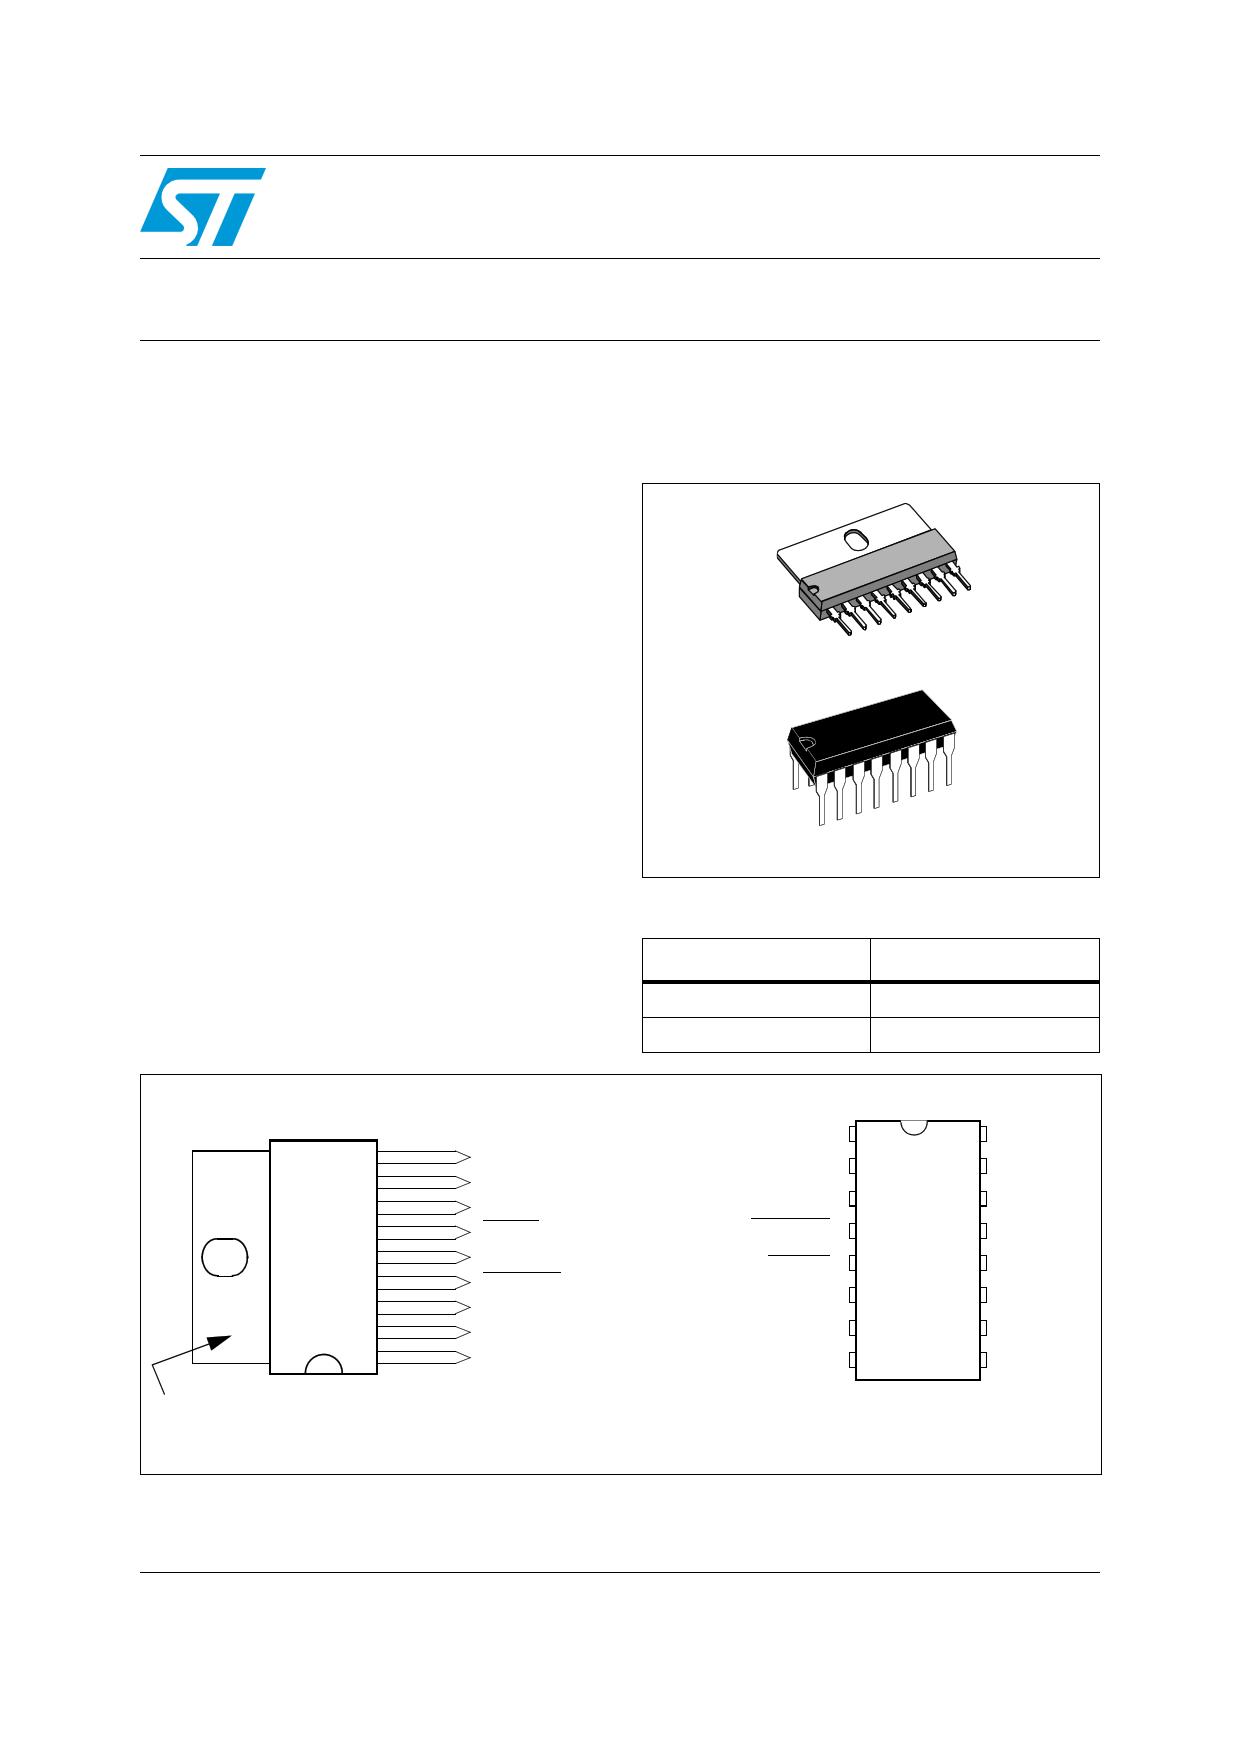 TDA8139D 데이터시트 및 TDA8139D PDF